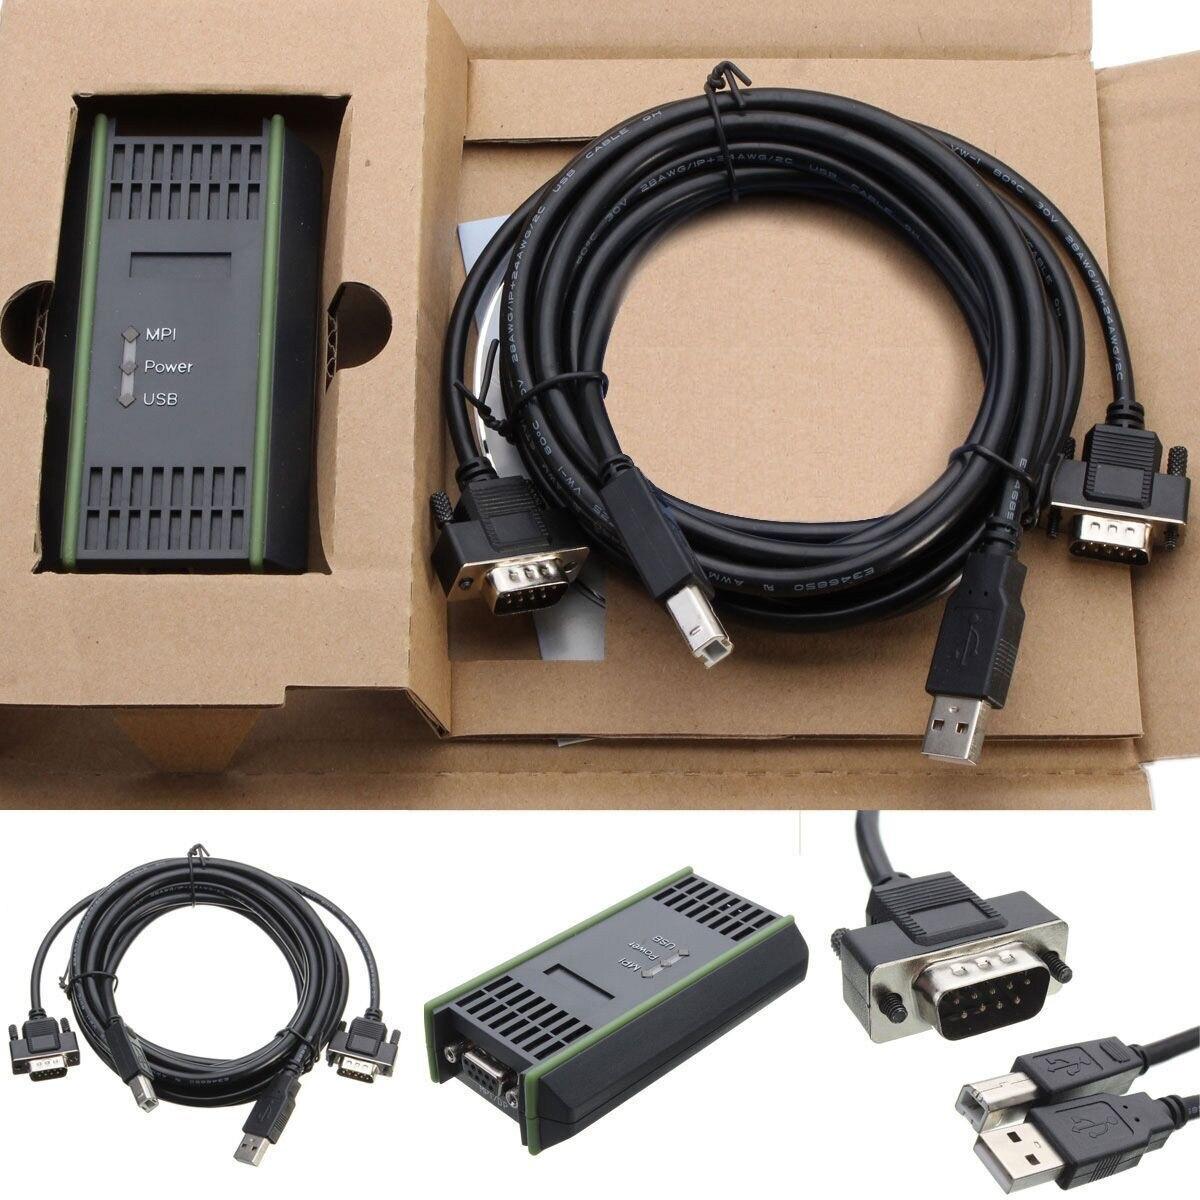 PC Adaptador USB Cabo Adaptador Para Siemens S7-200/300/400 RS485 Profibus/MPI/PPI 9- pin Substituir para Siemens 6ES7972-0CB20-0XA0